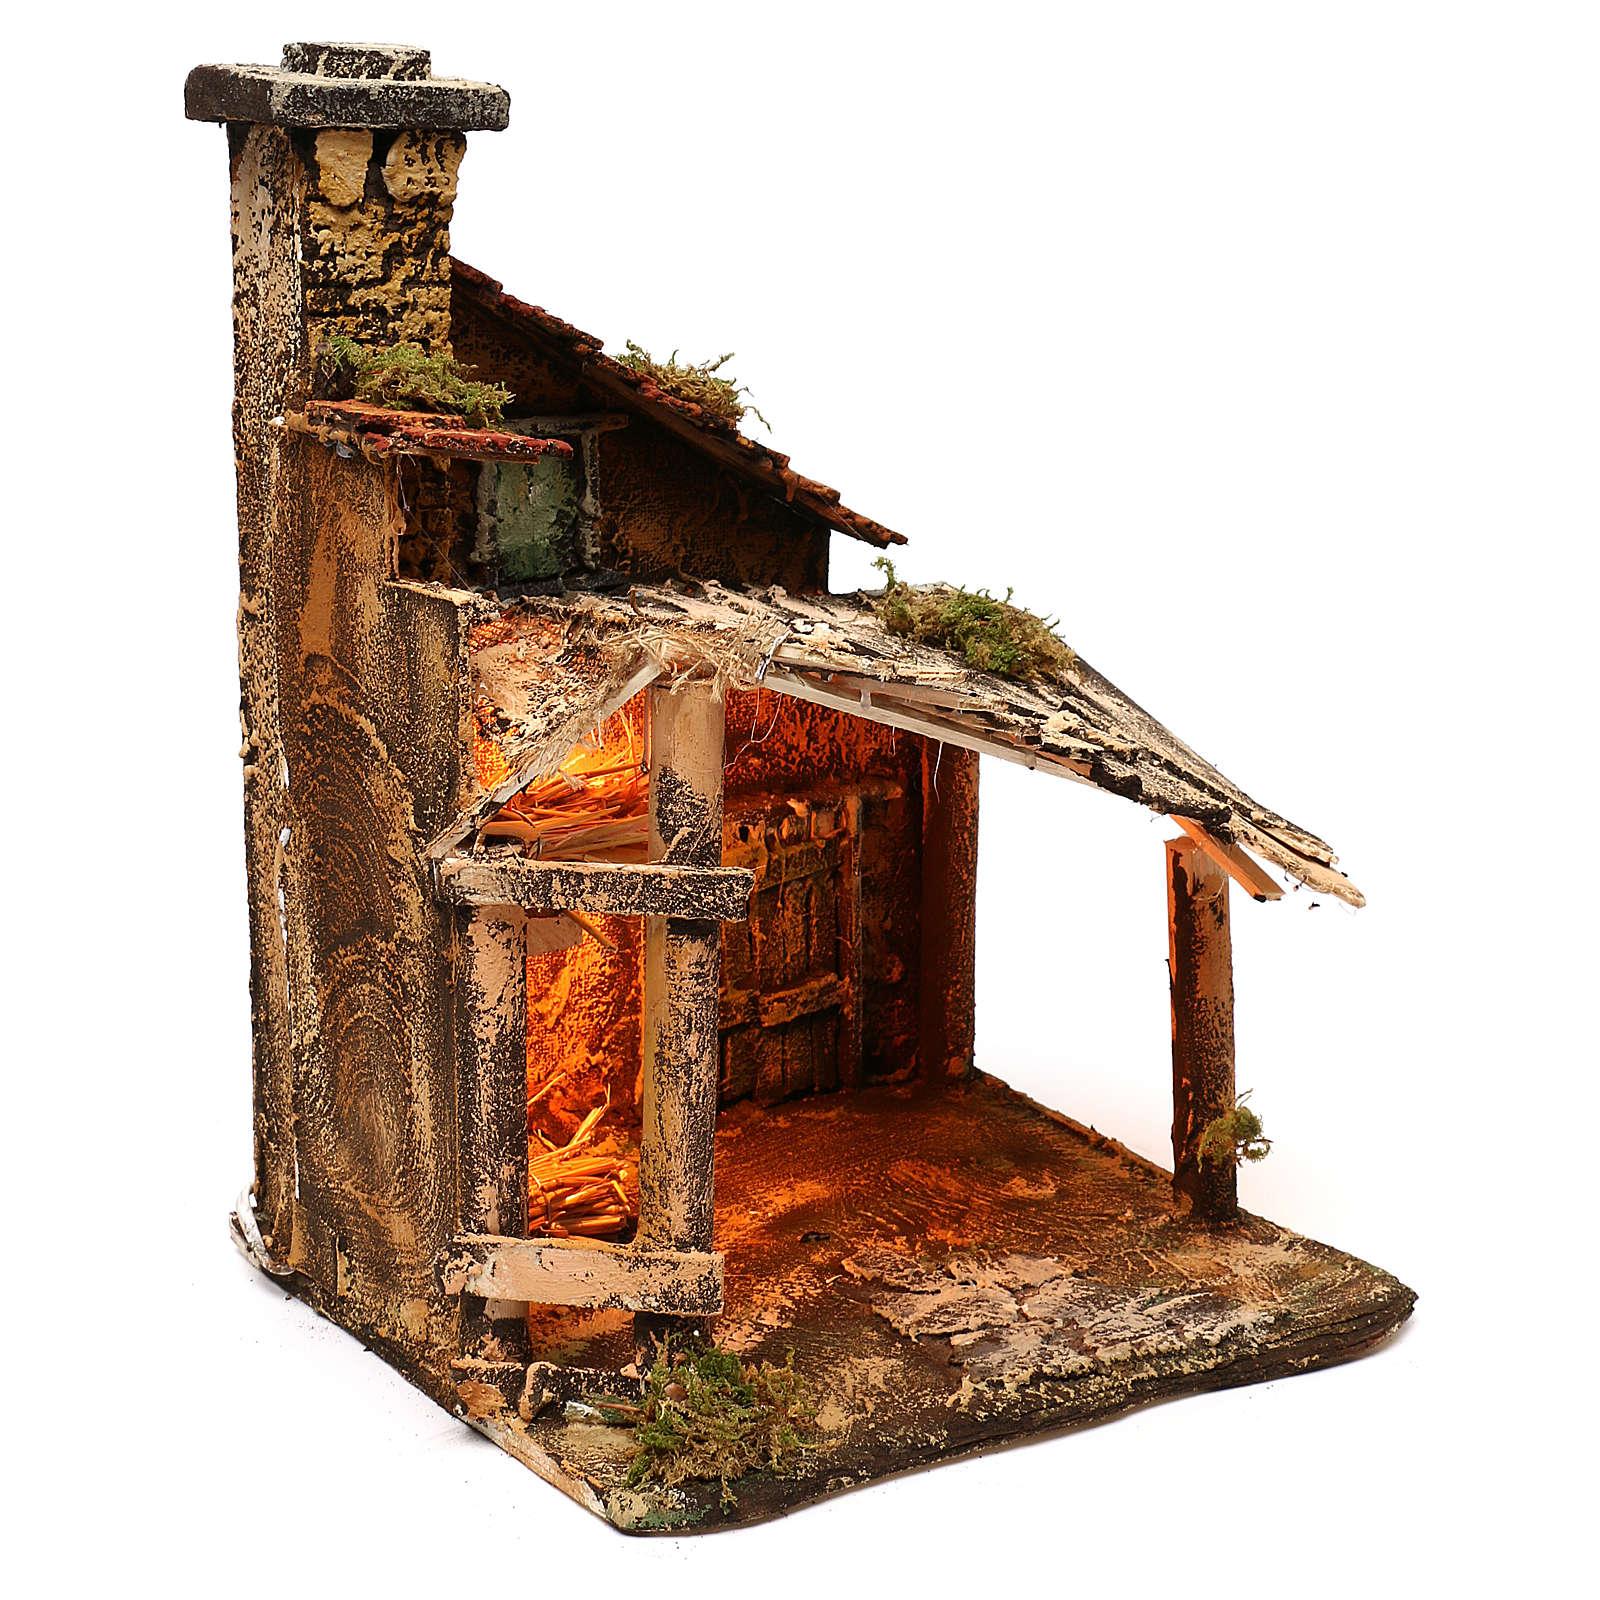 Hut with light for Nativity scene 30x30x40 cm 4